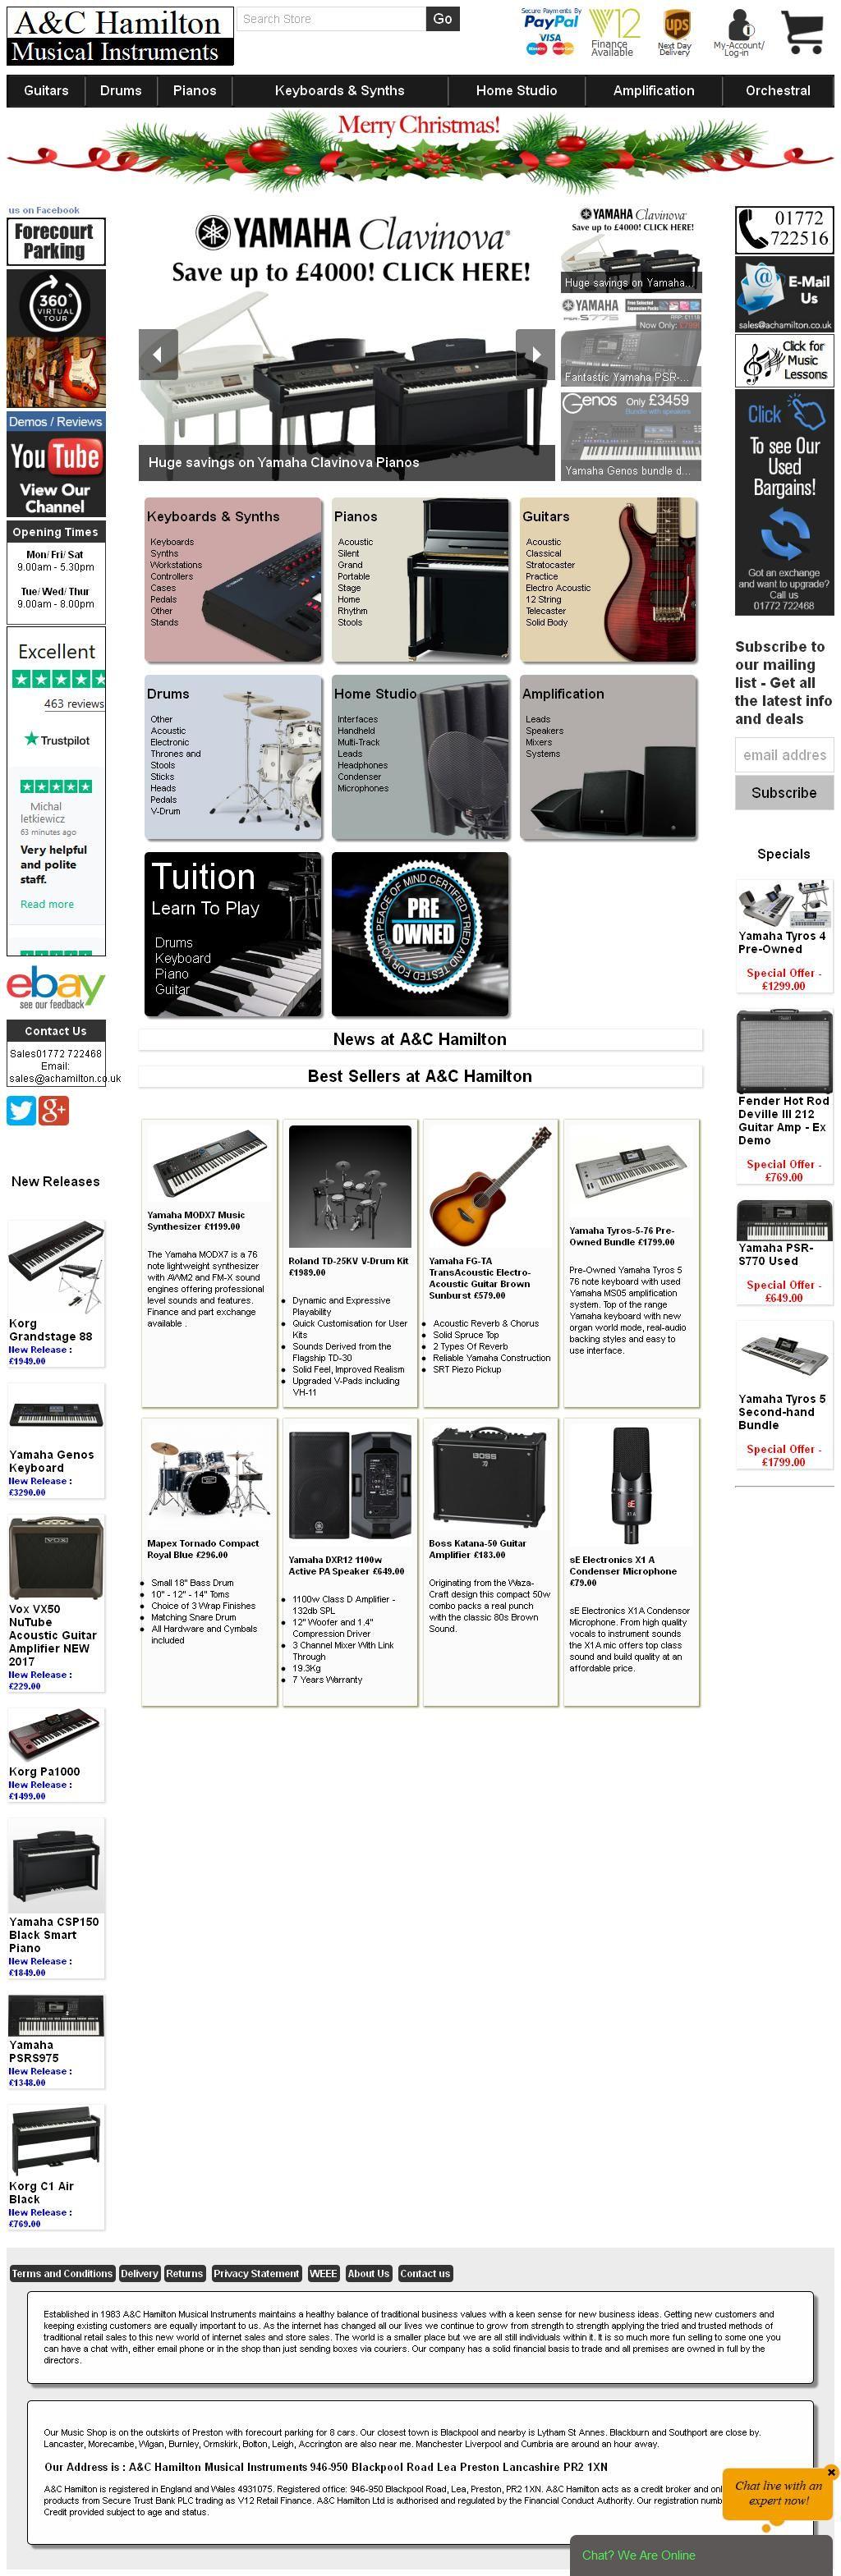 A & C Hamilton Musical Instruments & Sheet Music 946950